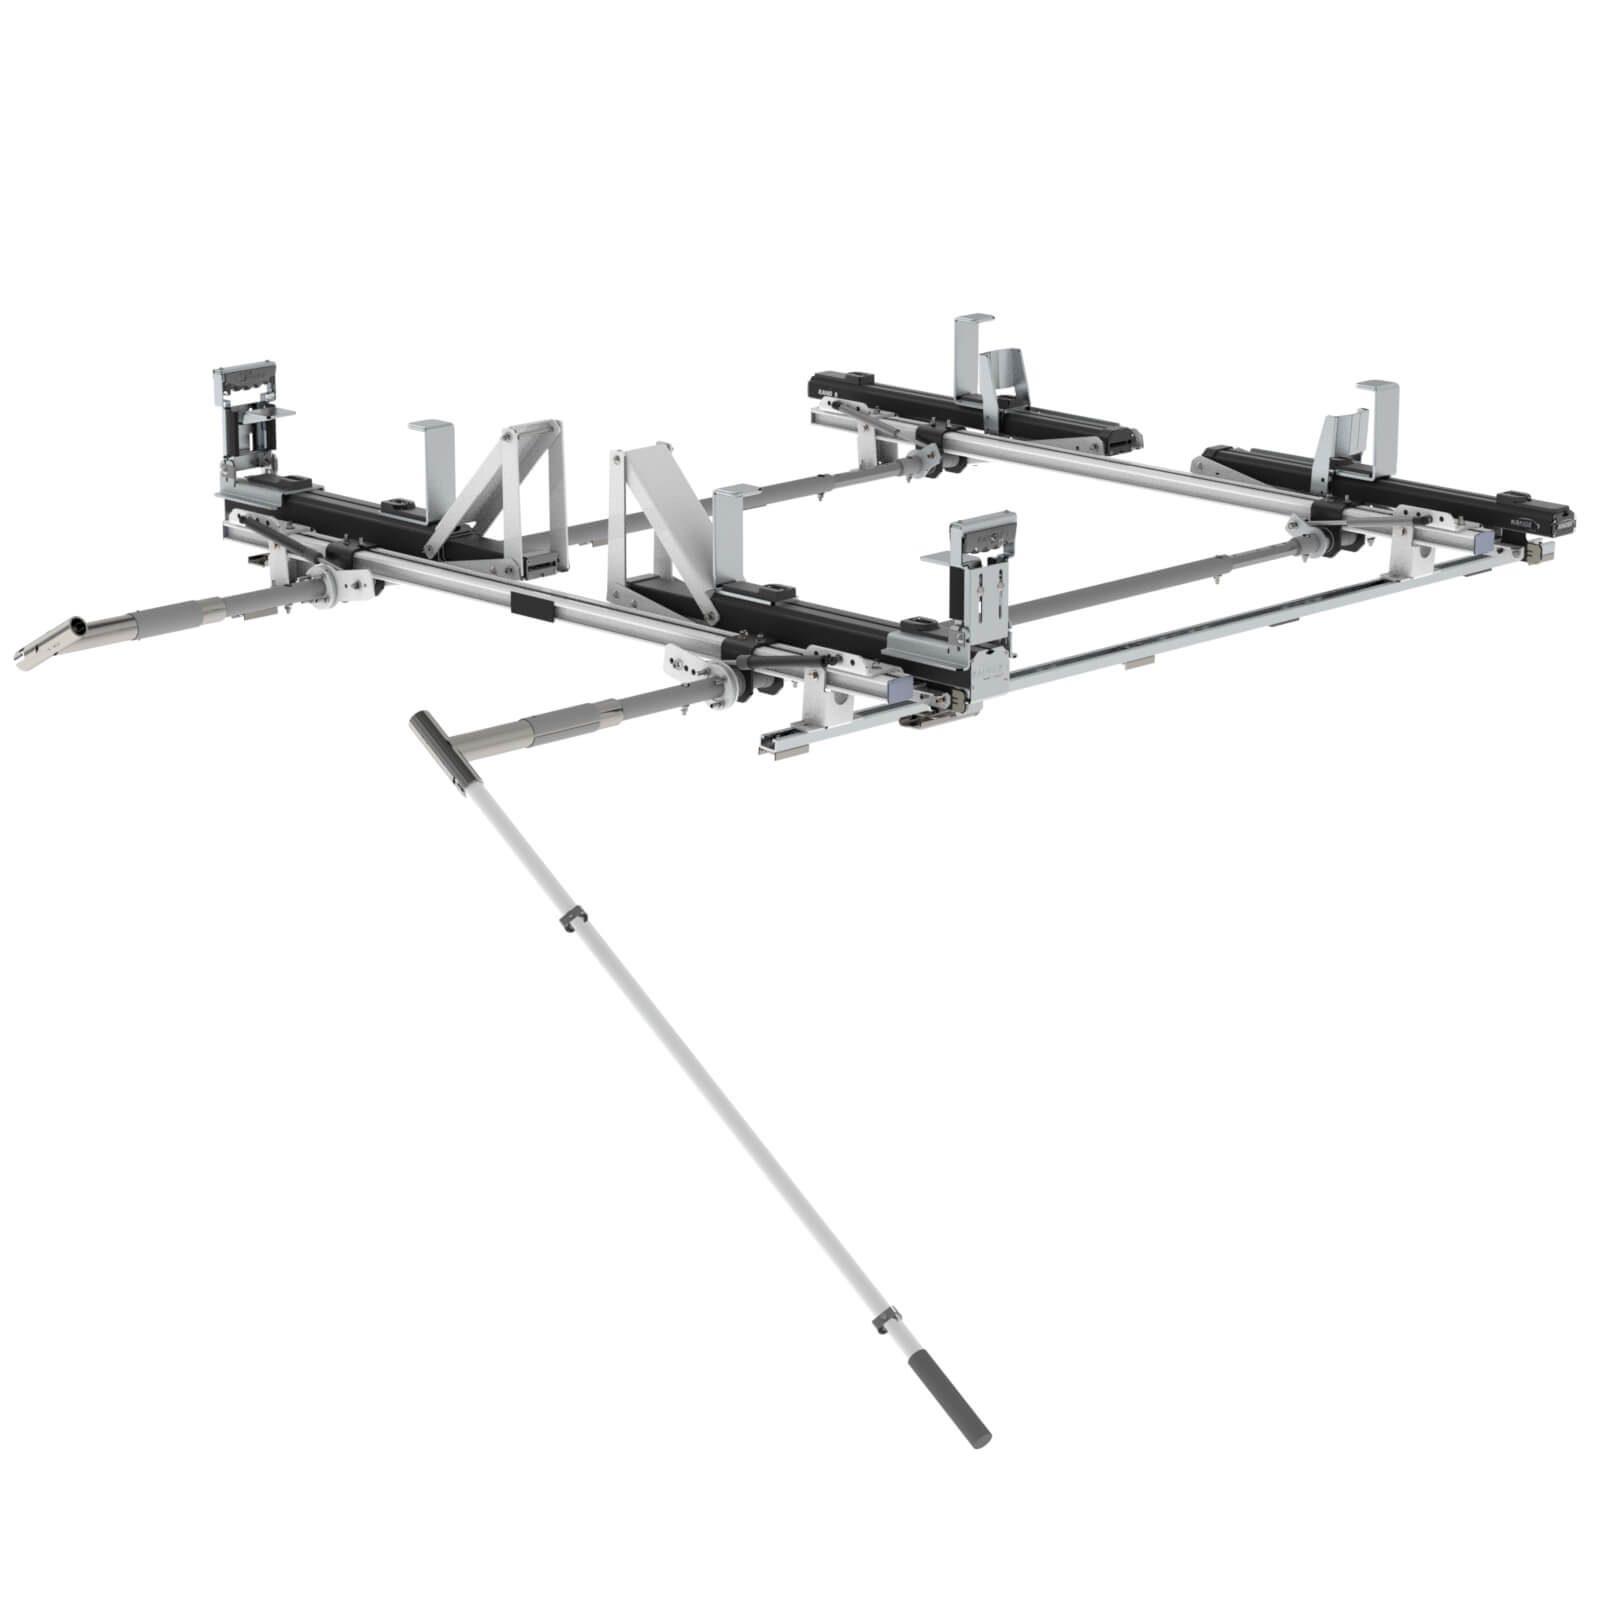 Max Rack 2 0 Drop Down Ladder Rack Double Side Ram